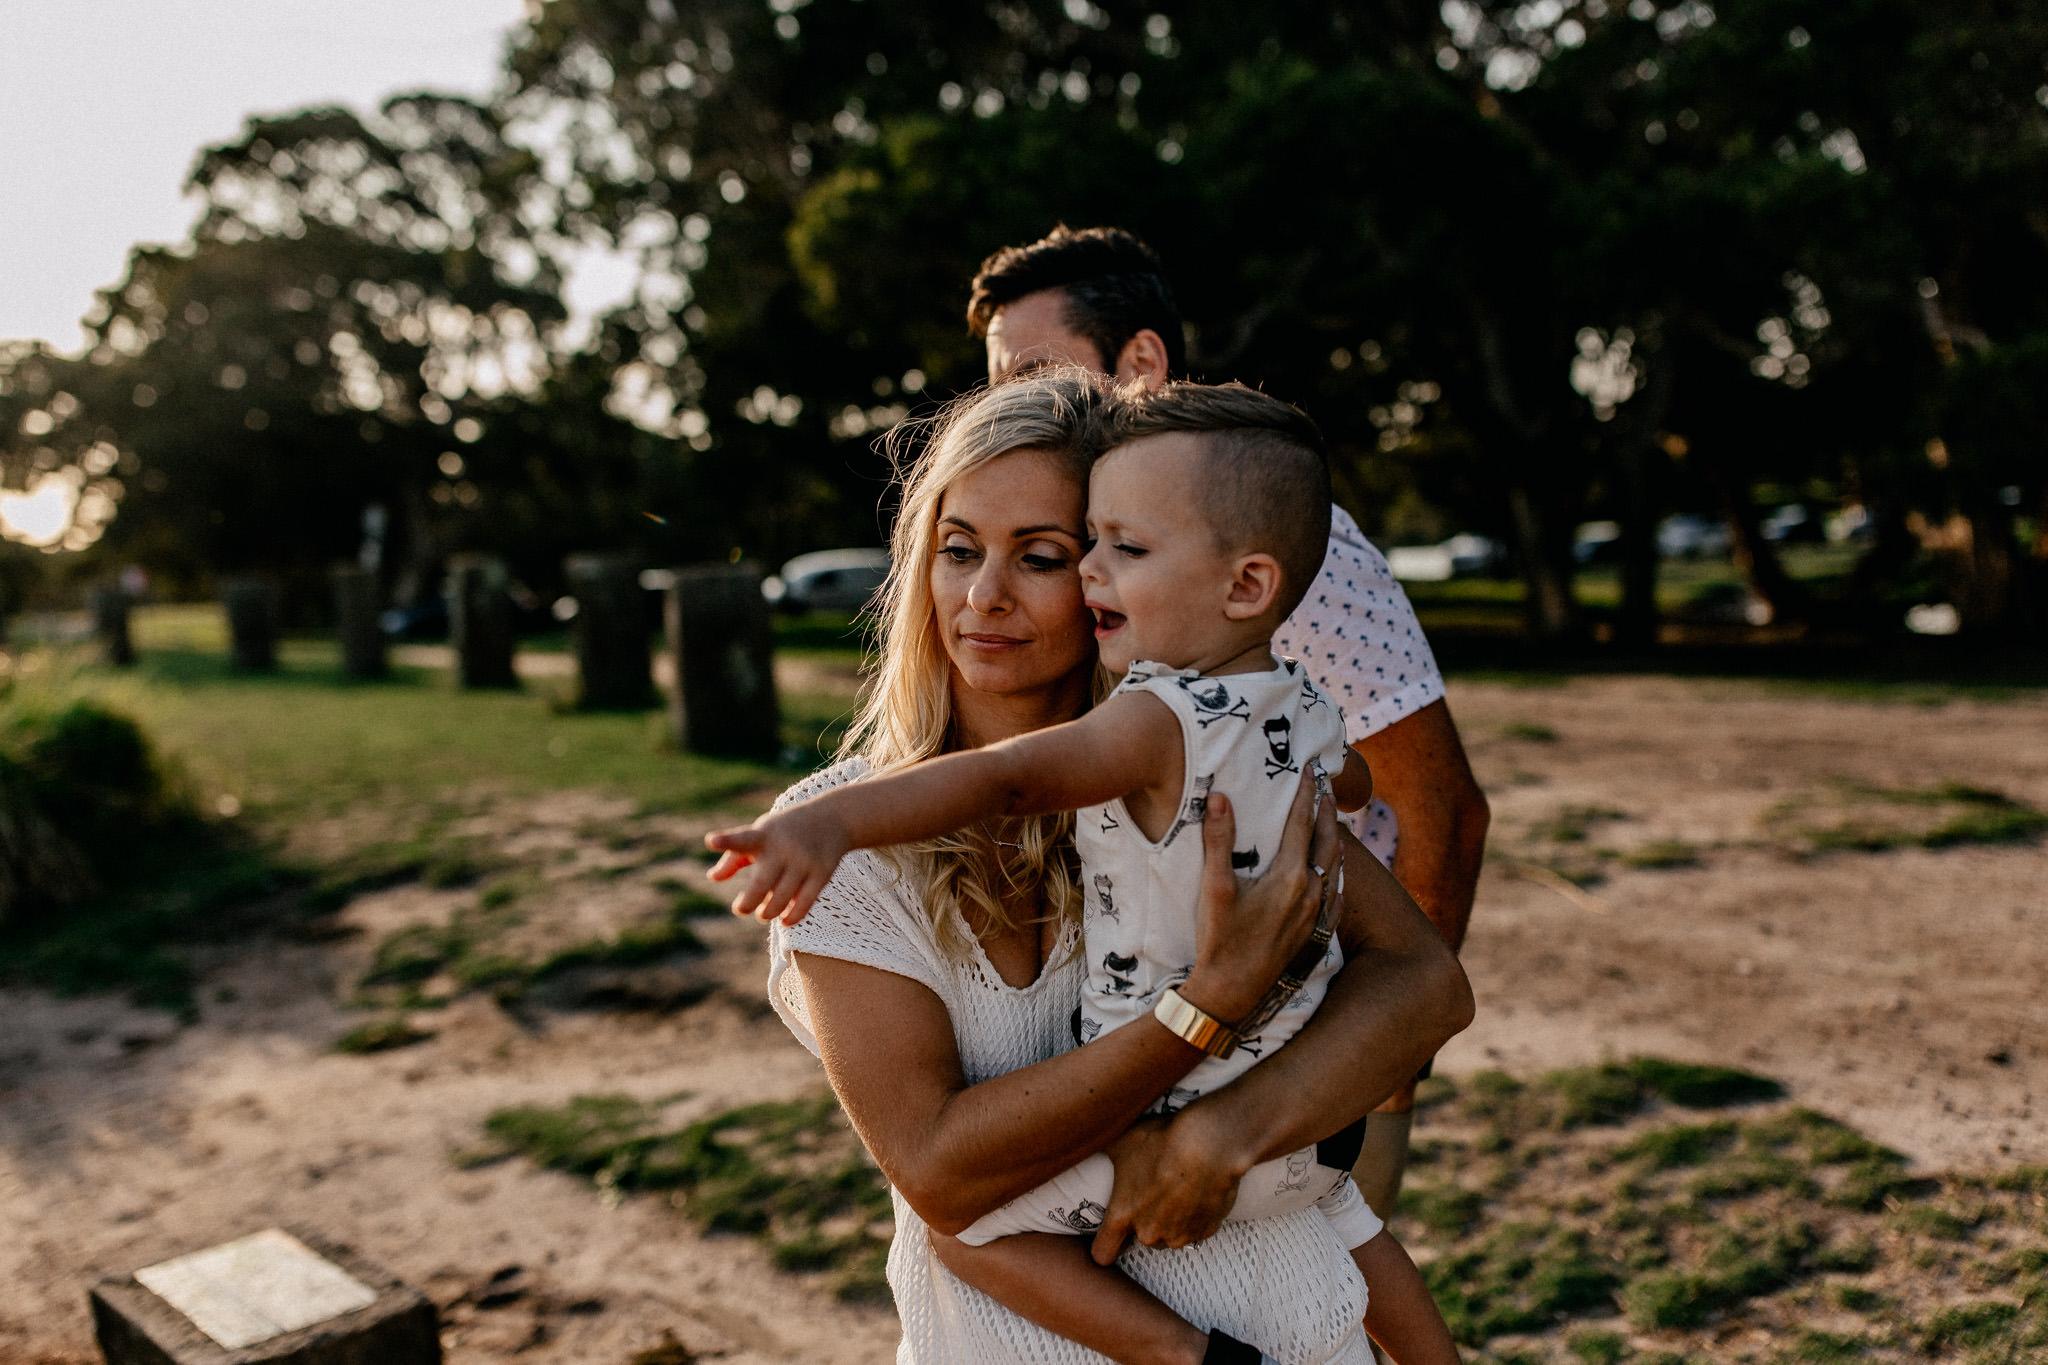 Family photographer sydney 56